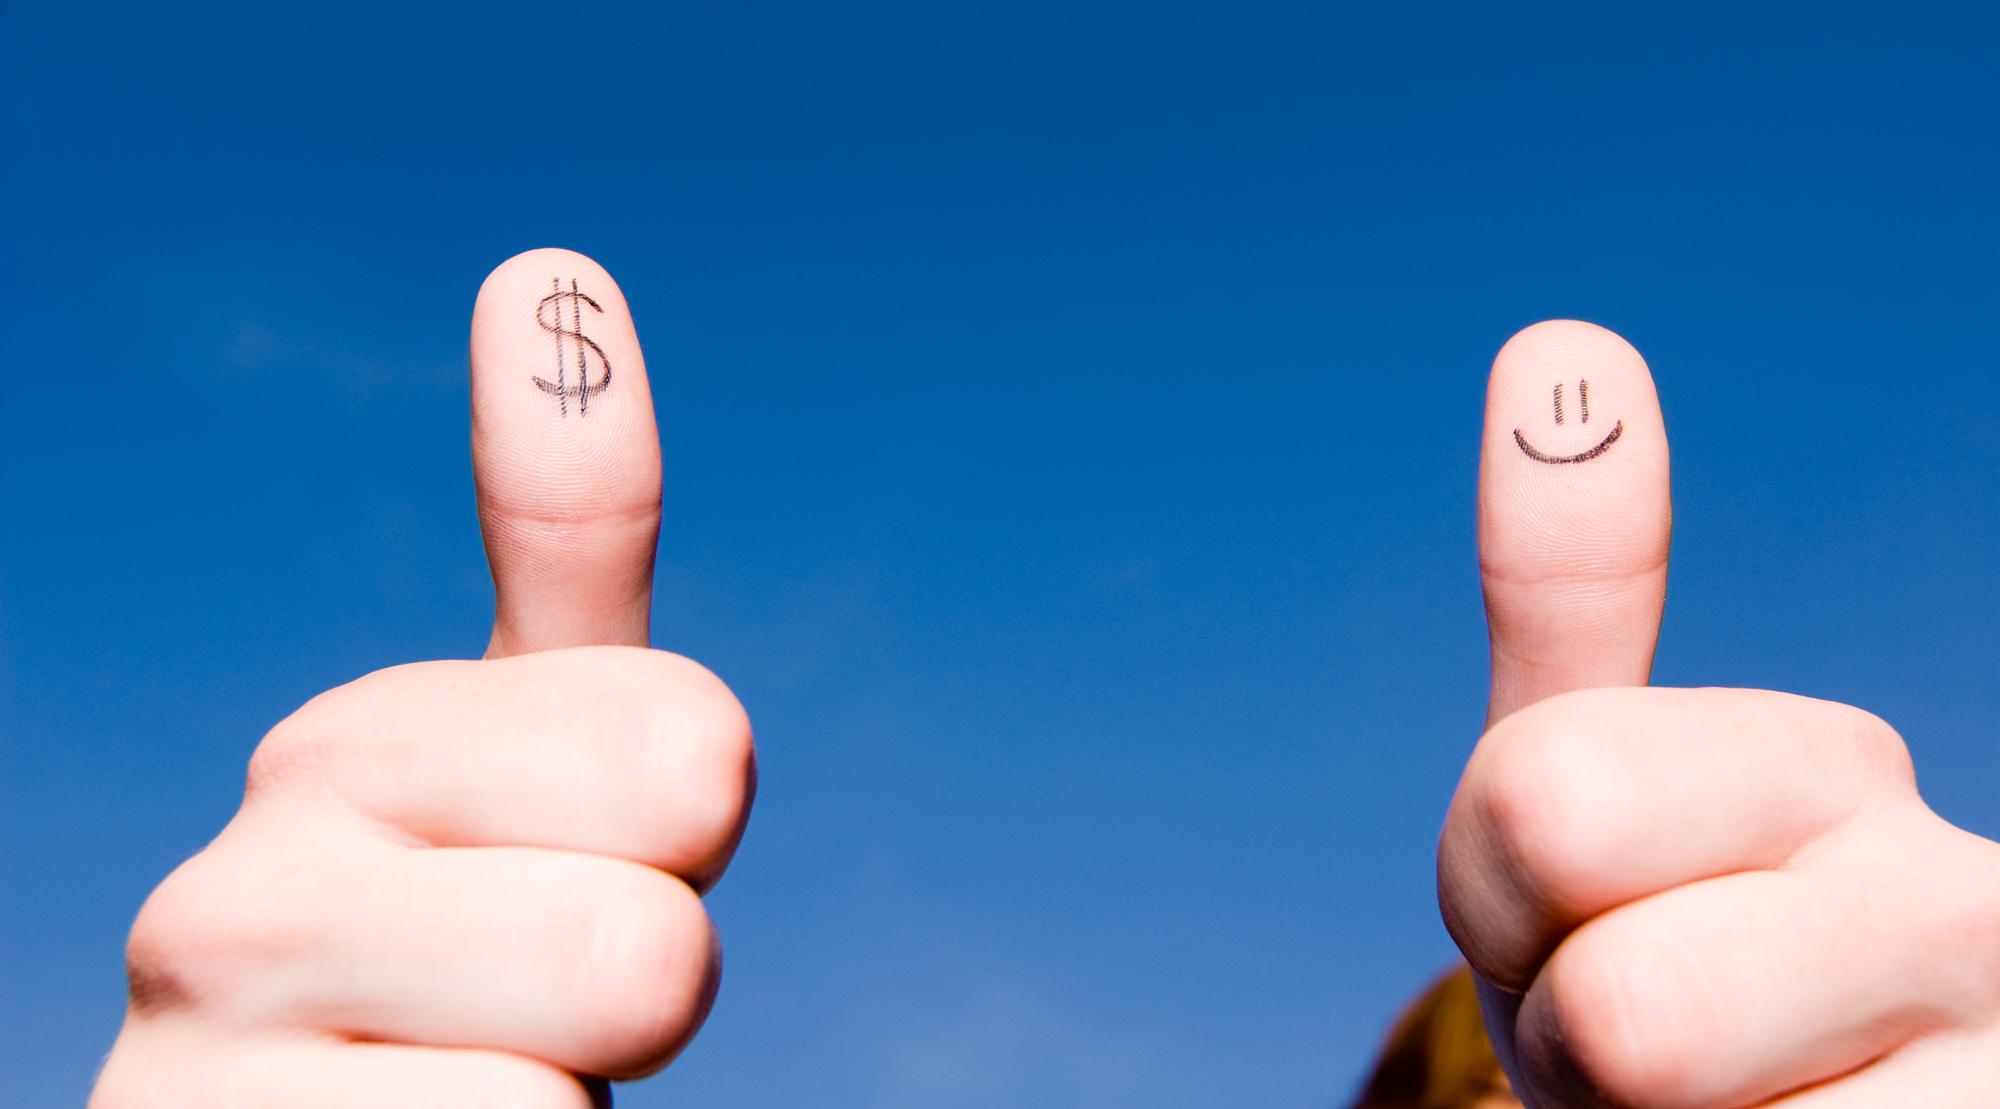 Revenue, Profit, customer service, SEO, Customer Experience, Design, UX, Shopping Cart, Social Media